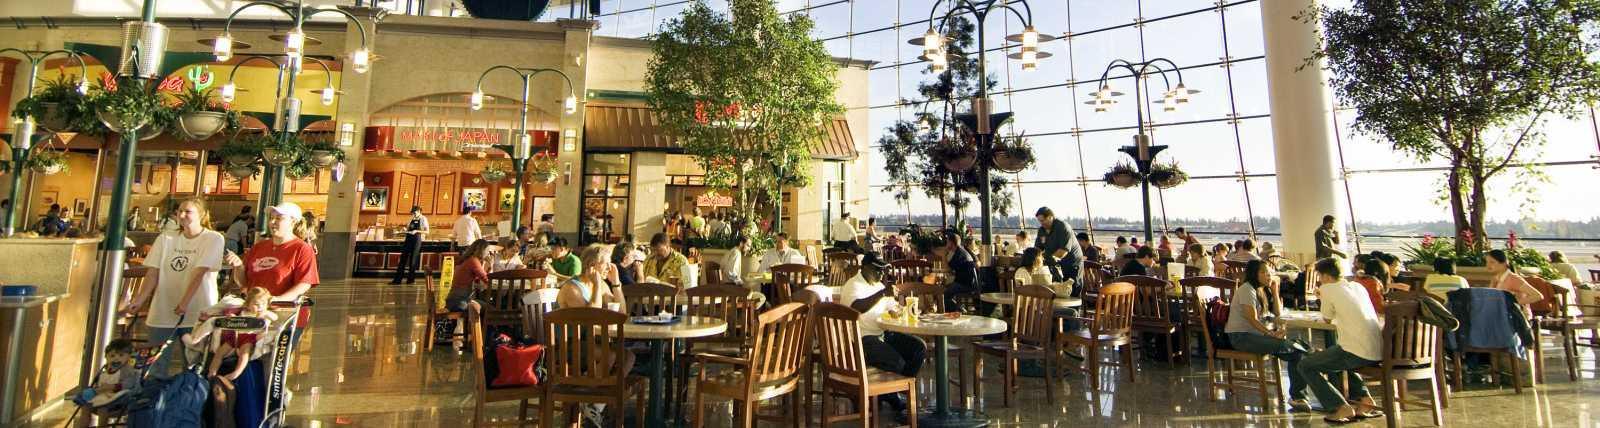 Sea-Tac Airport Interior